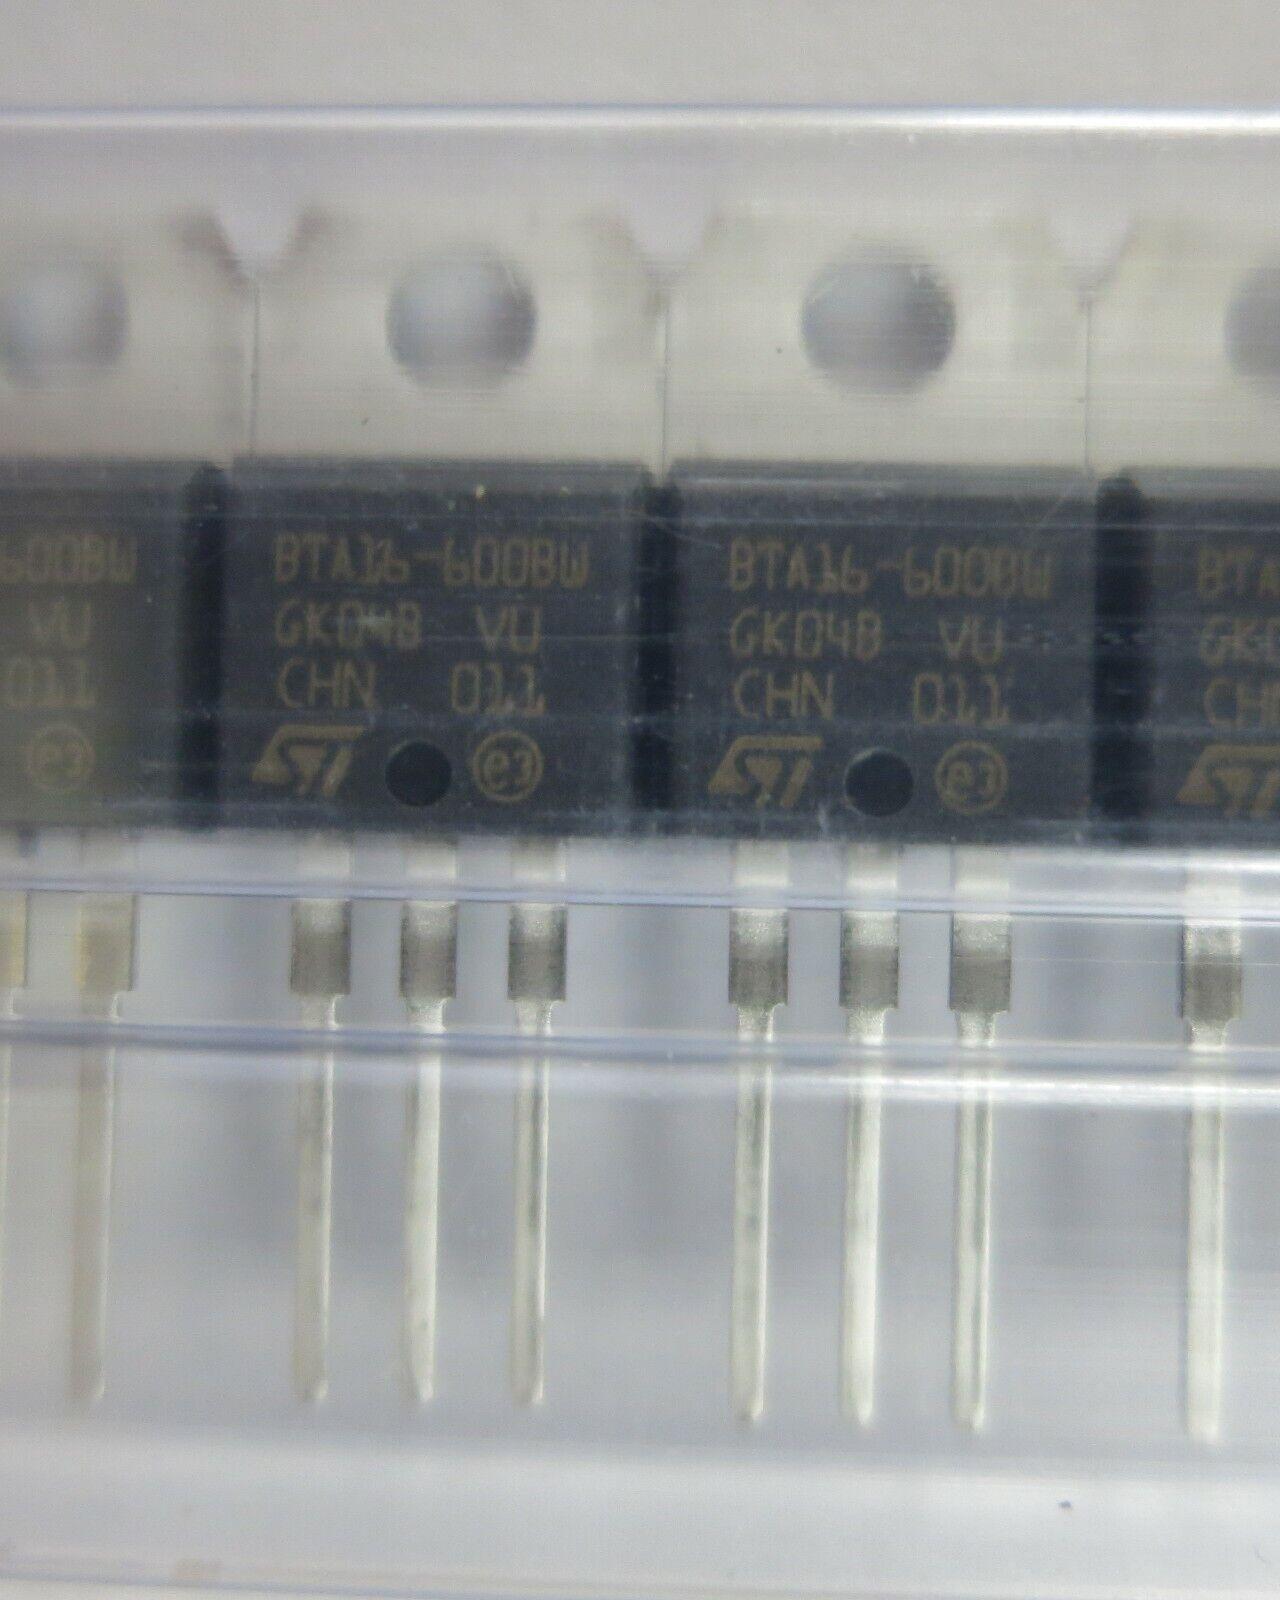 STMicroelectronics-btb16-700bwrg TRIAC 16A 700V TO220AB